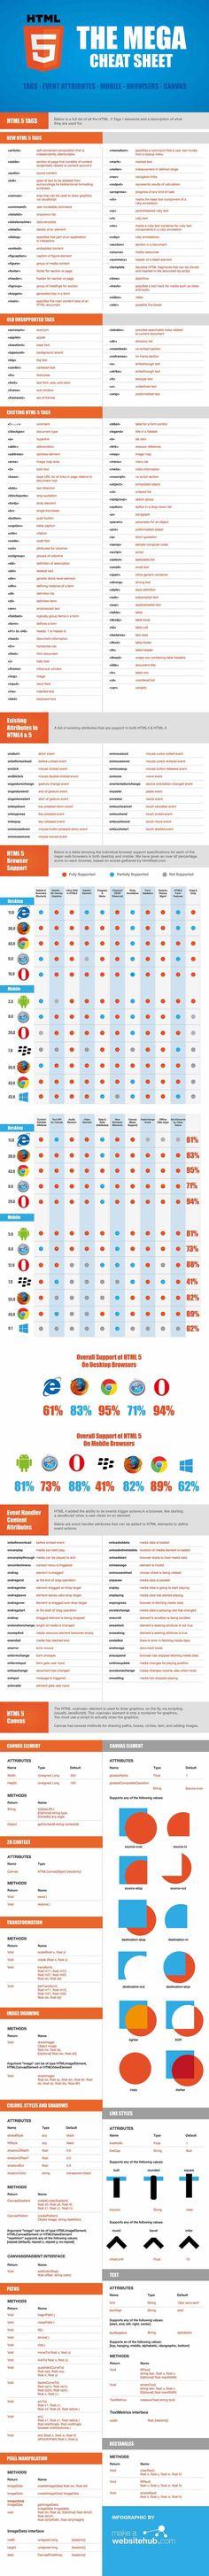 The HTML5 Mega Cheat Sheet